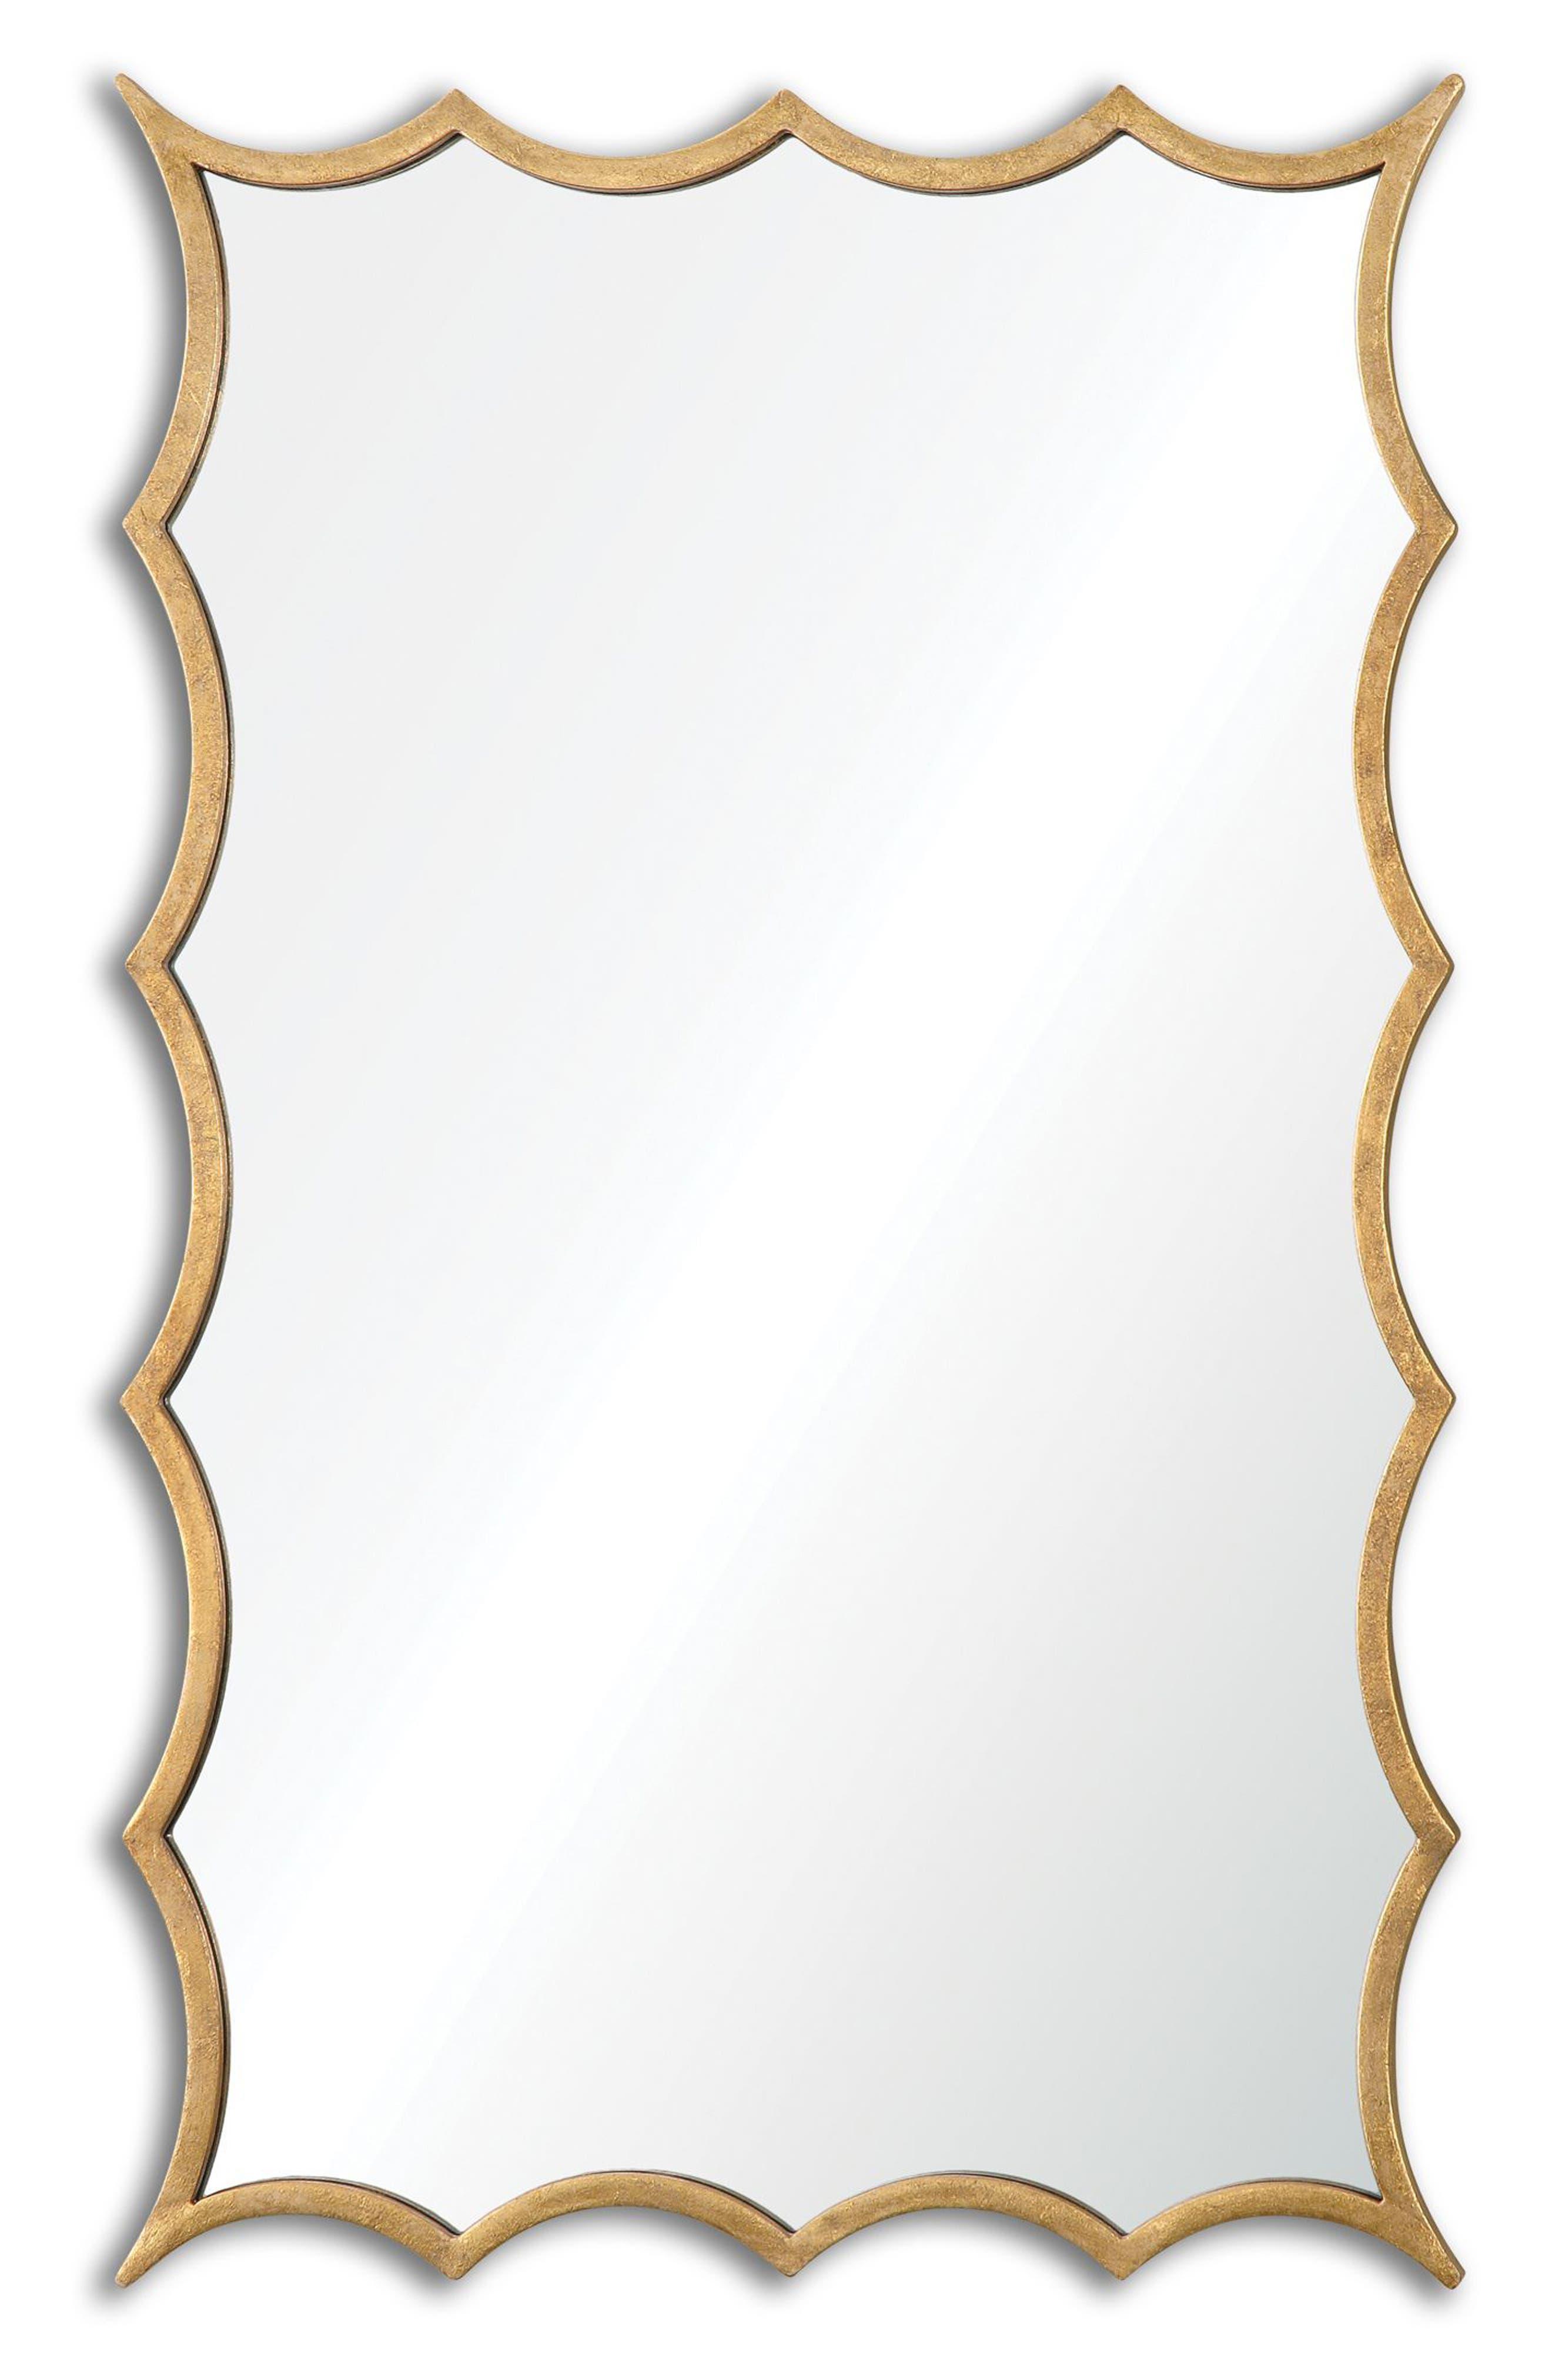 Uttermost Dareios Wall Mirror Photo Gallery